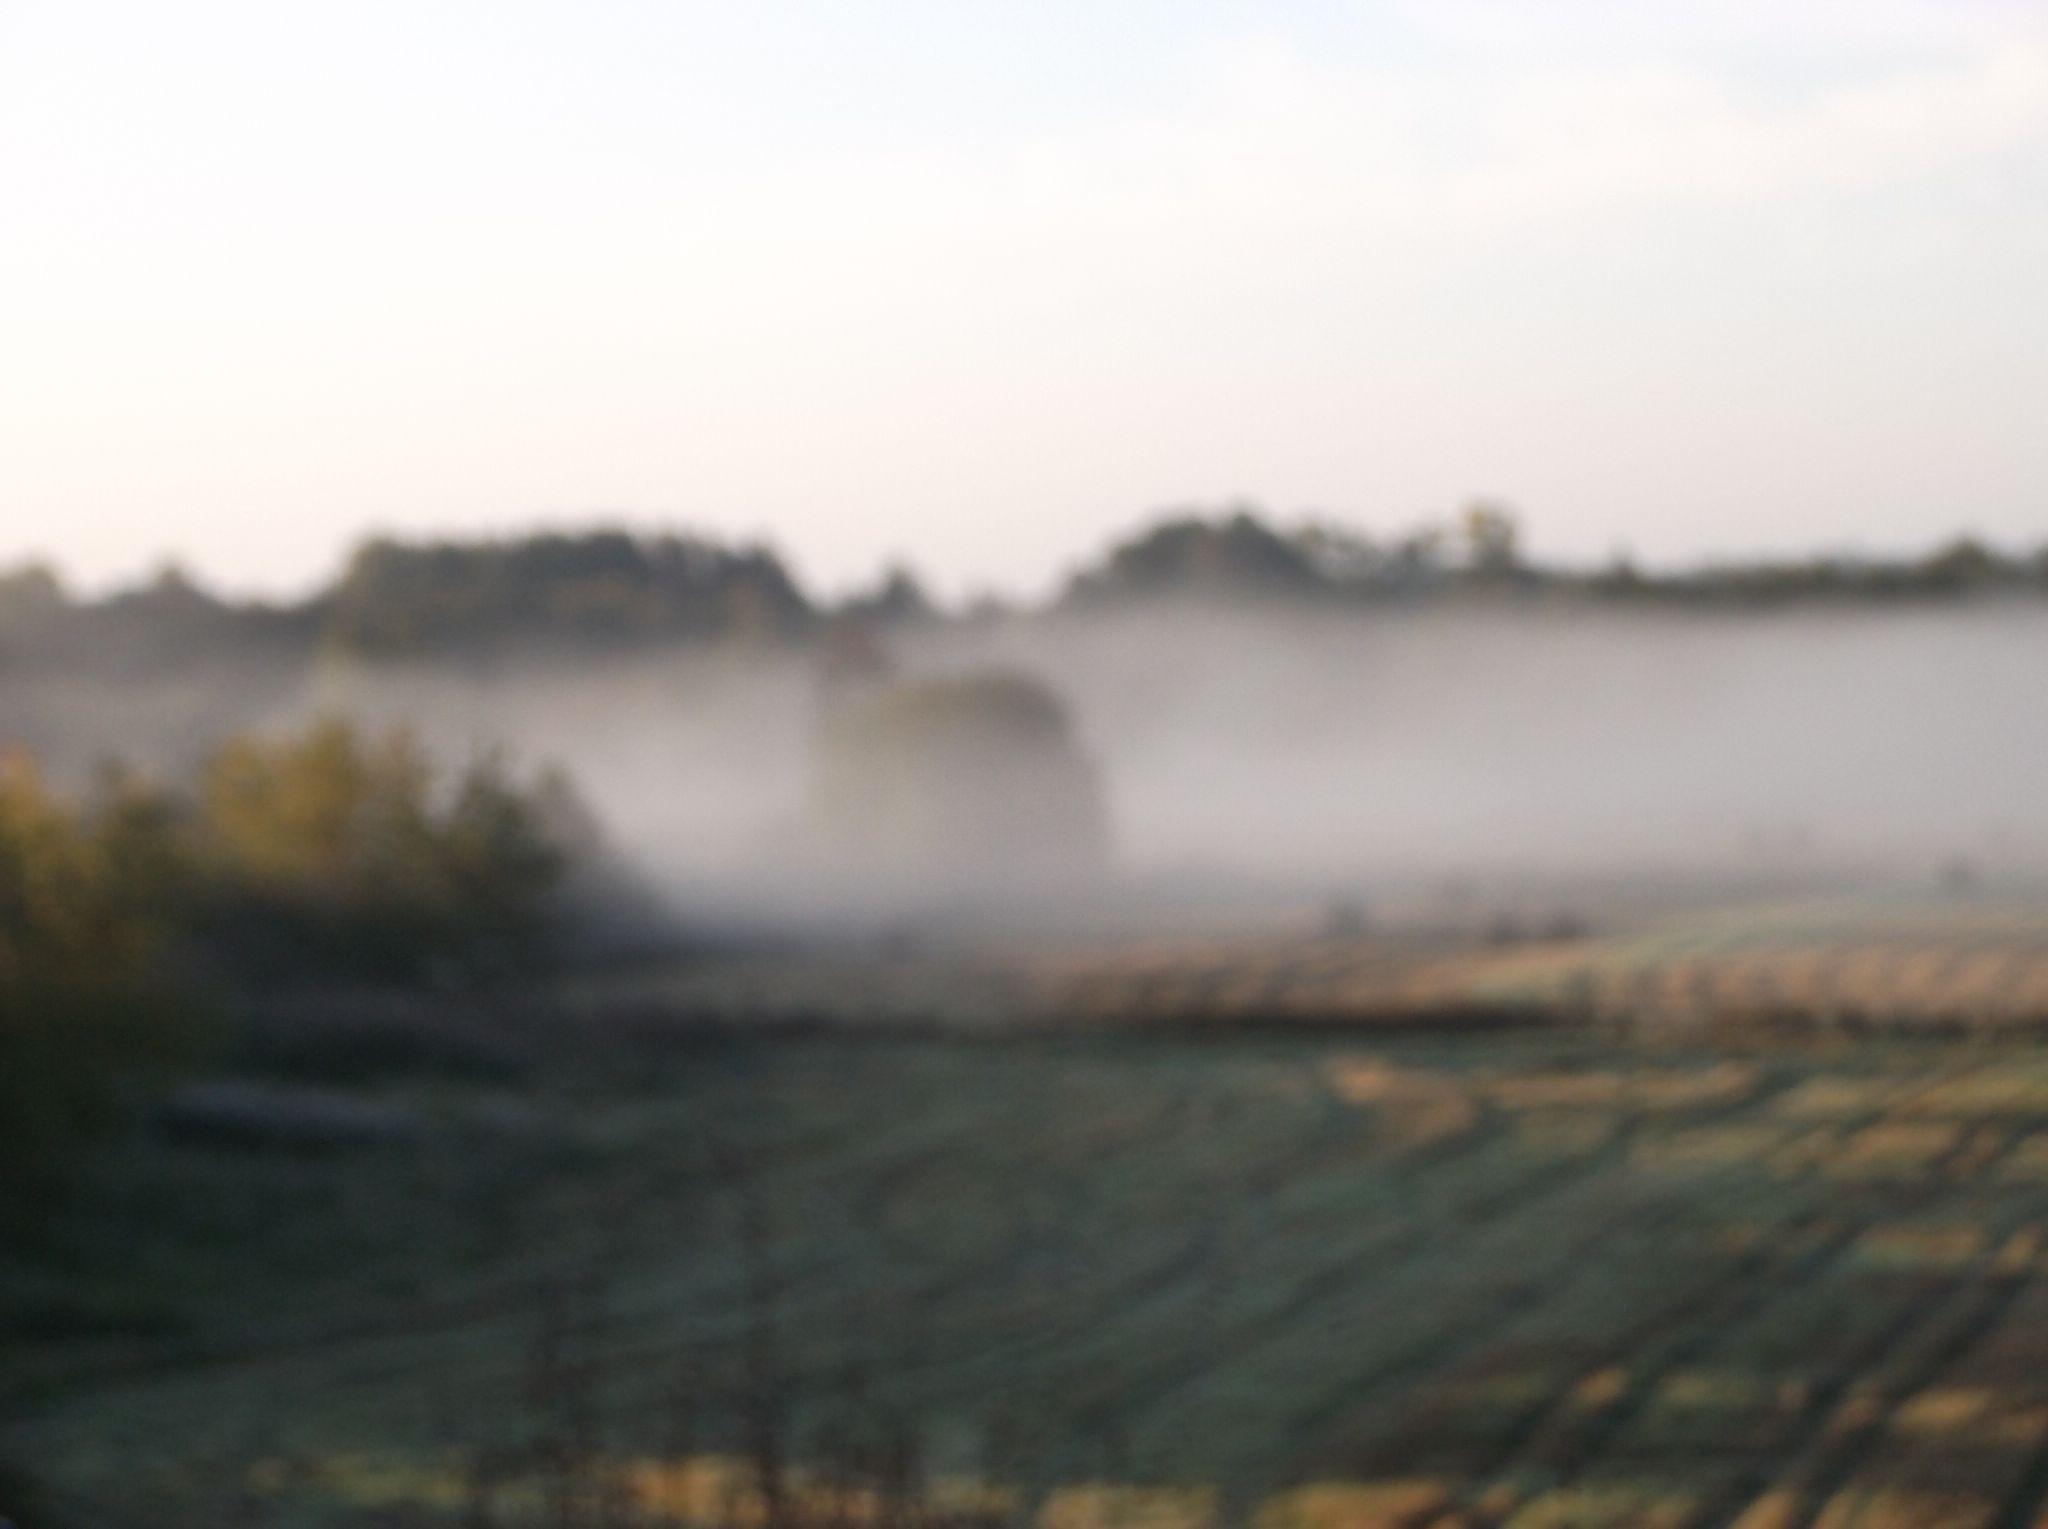 Drowned in the fog. by Zita Užkuraitienė